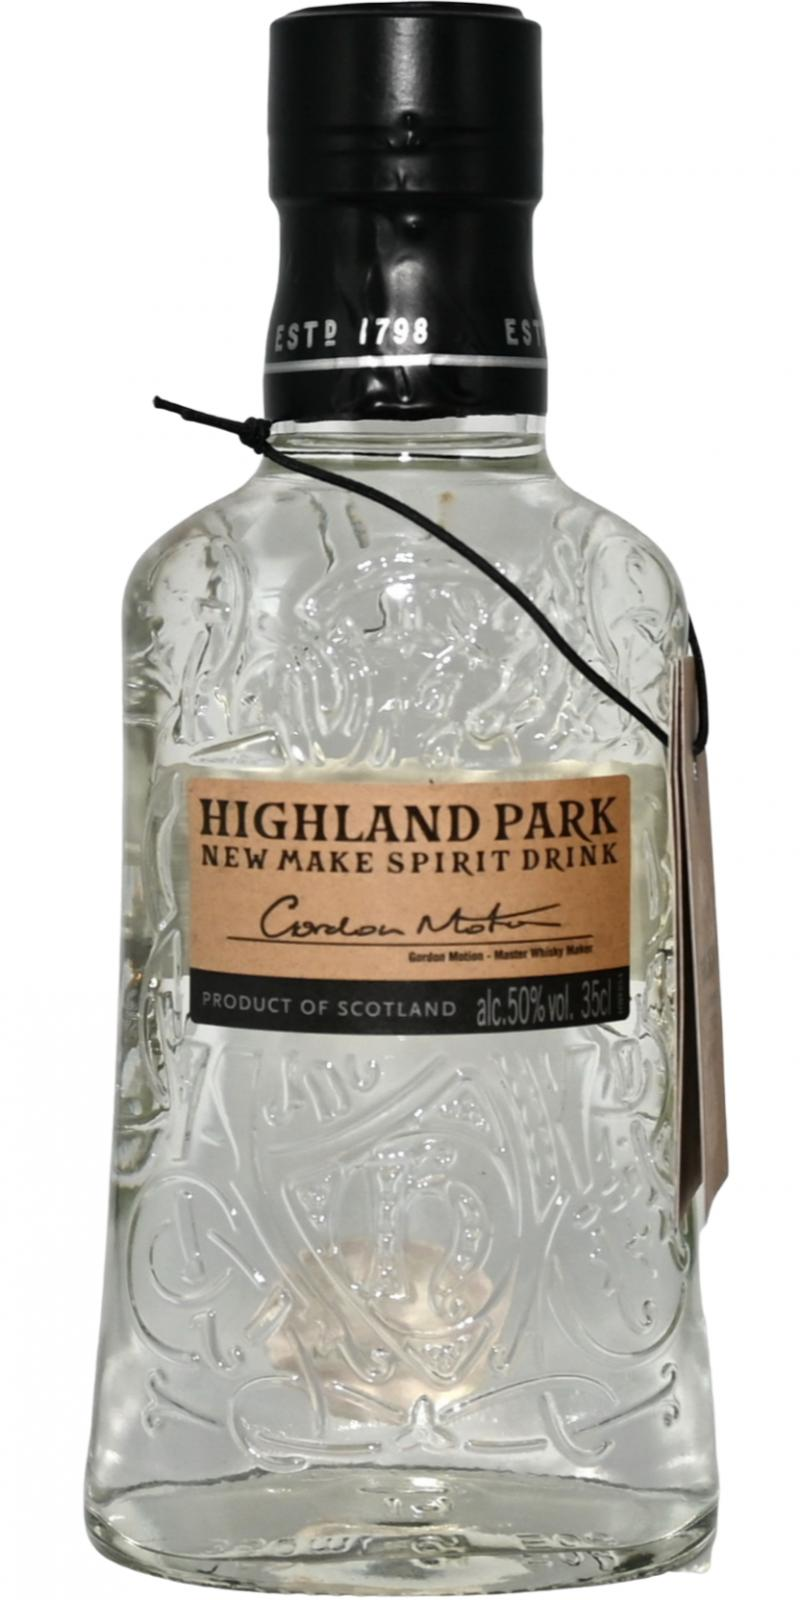 Highland Park Tunglskin